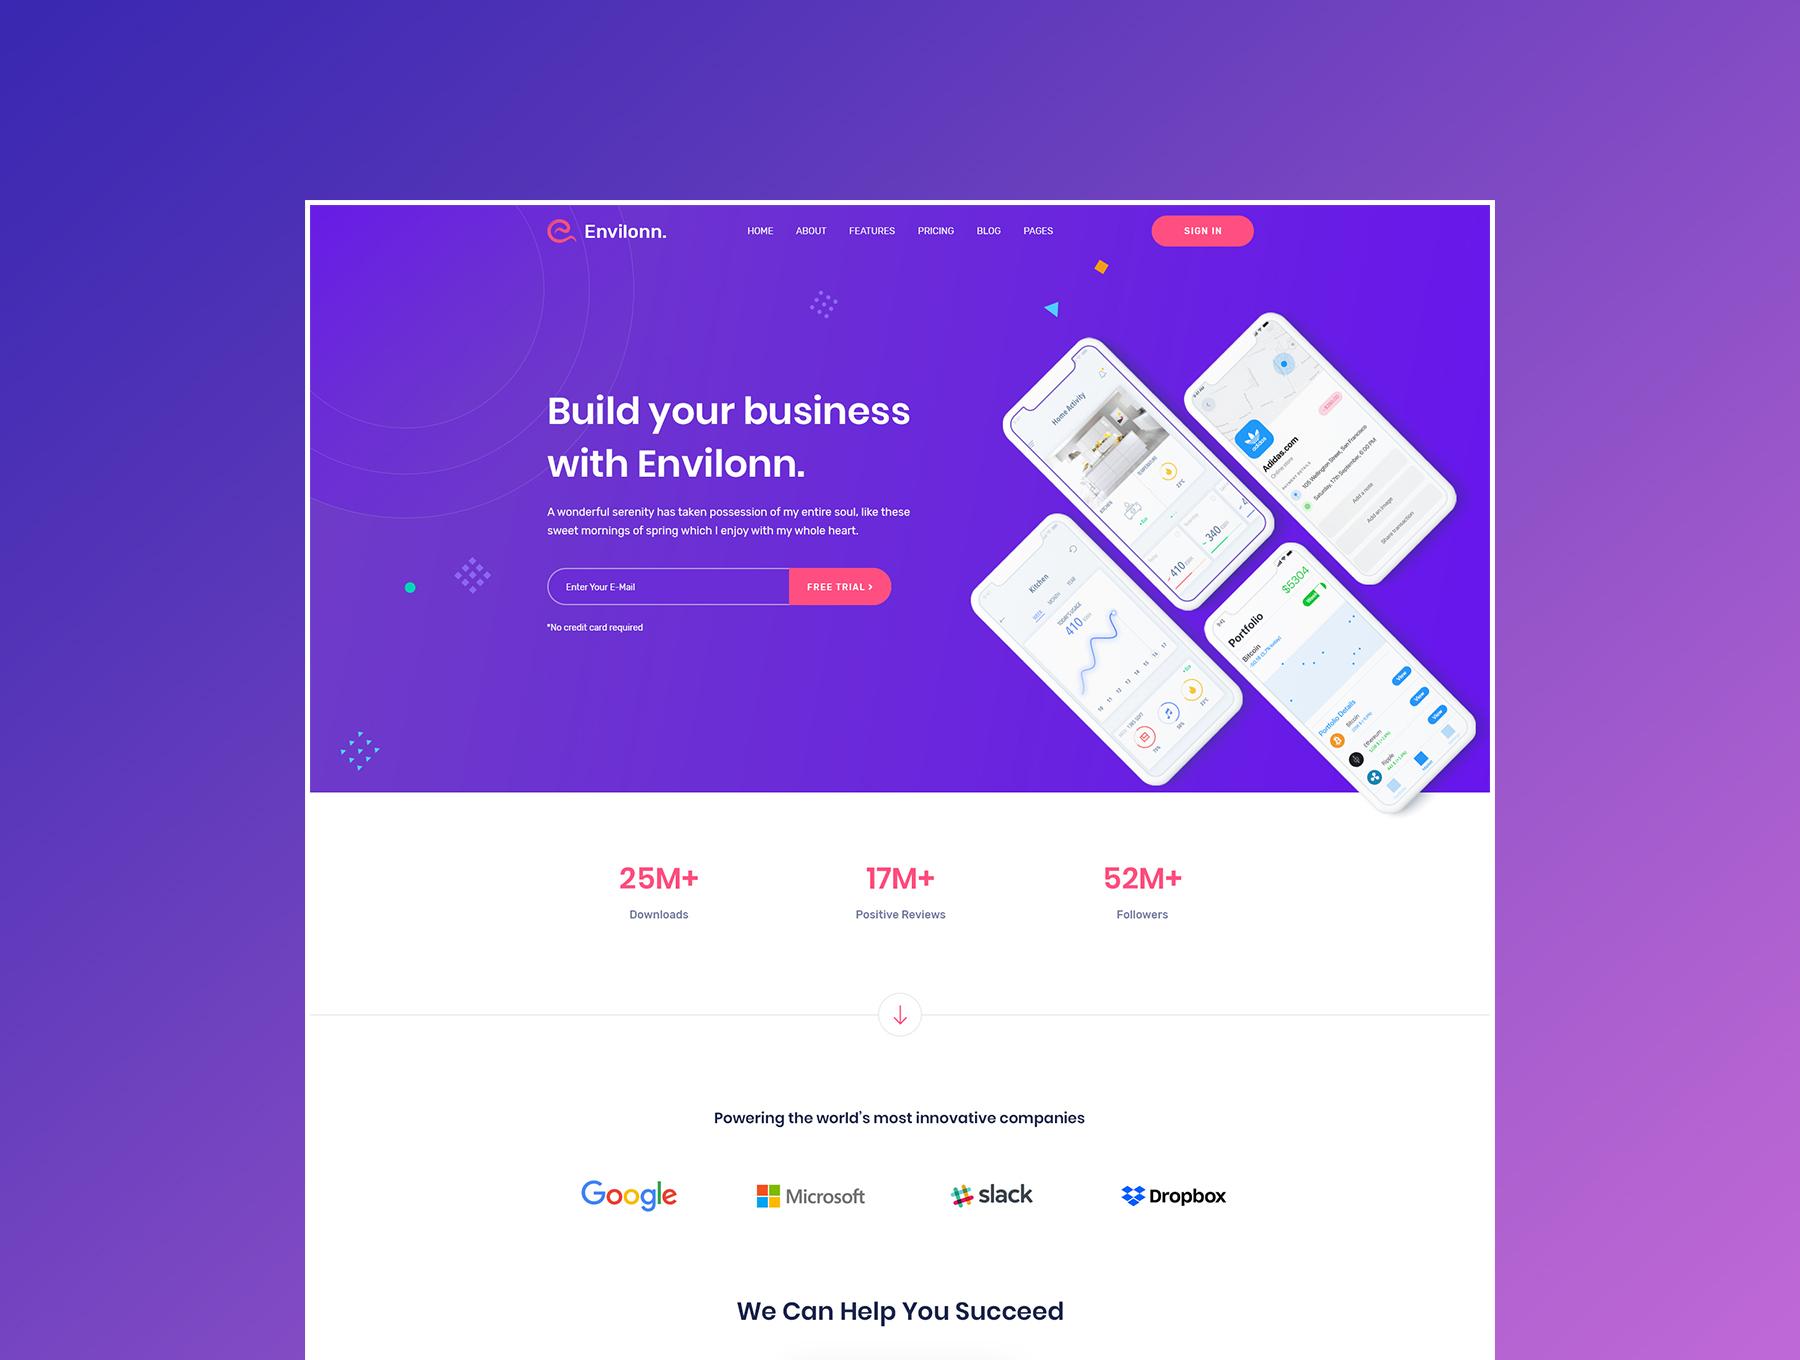 时尚新颖软件&应用程序登陆页UI界面设计模板套件 Envilonn – Saas, Software & App Landing Page插图(2)